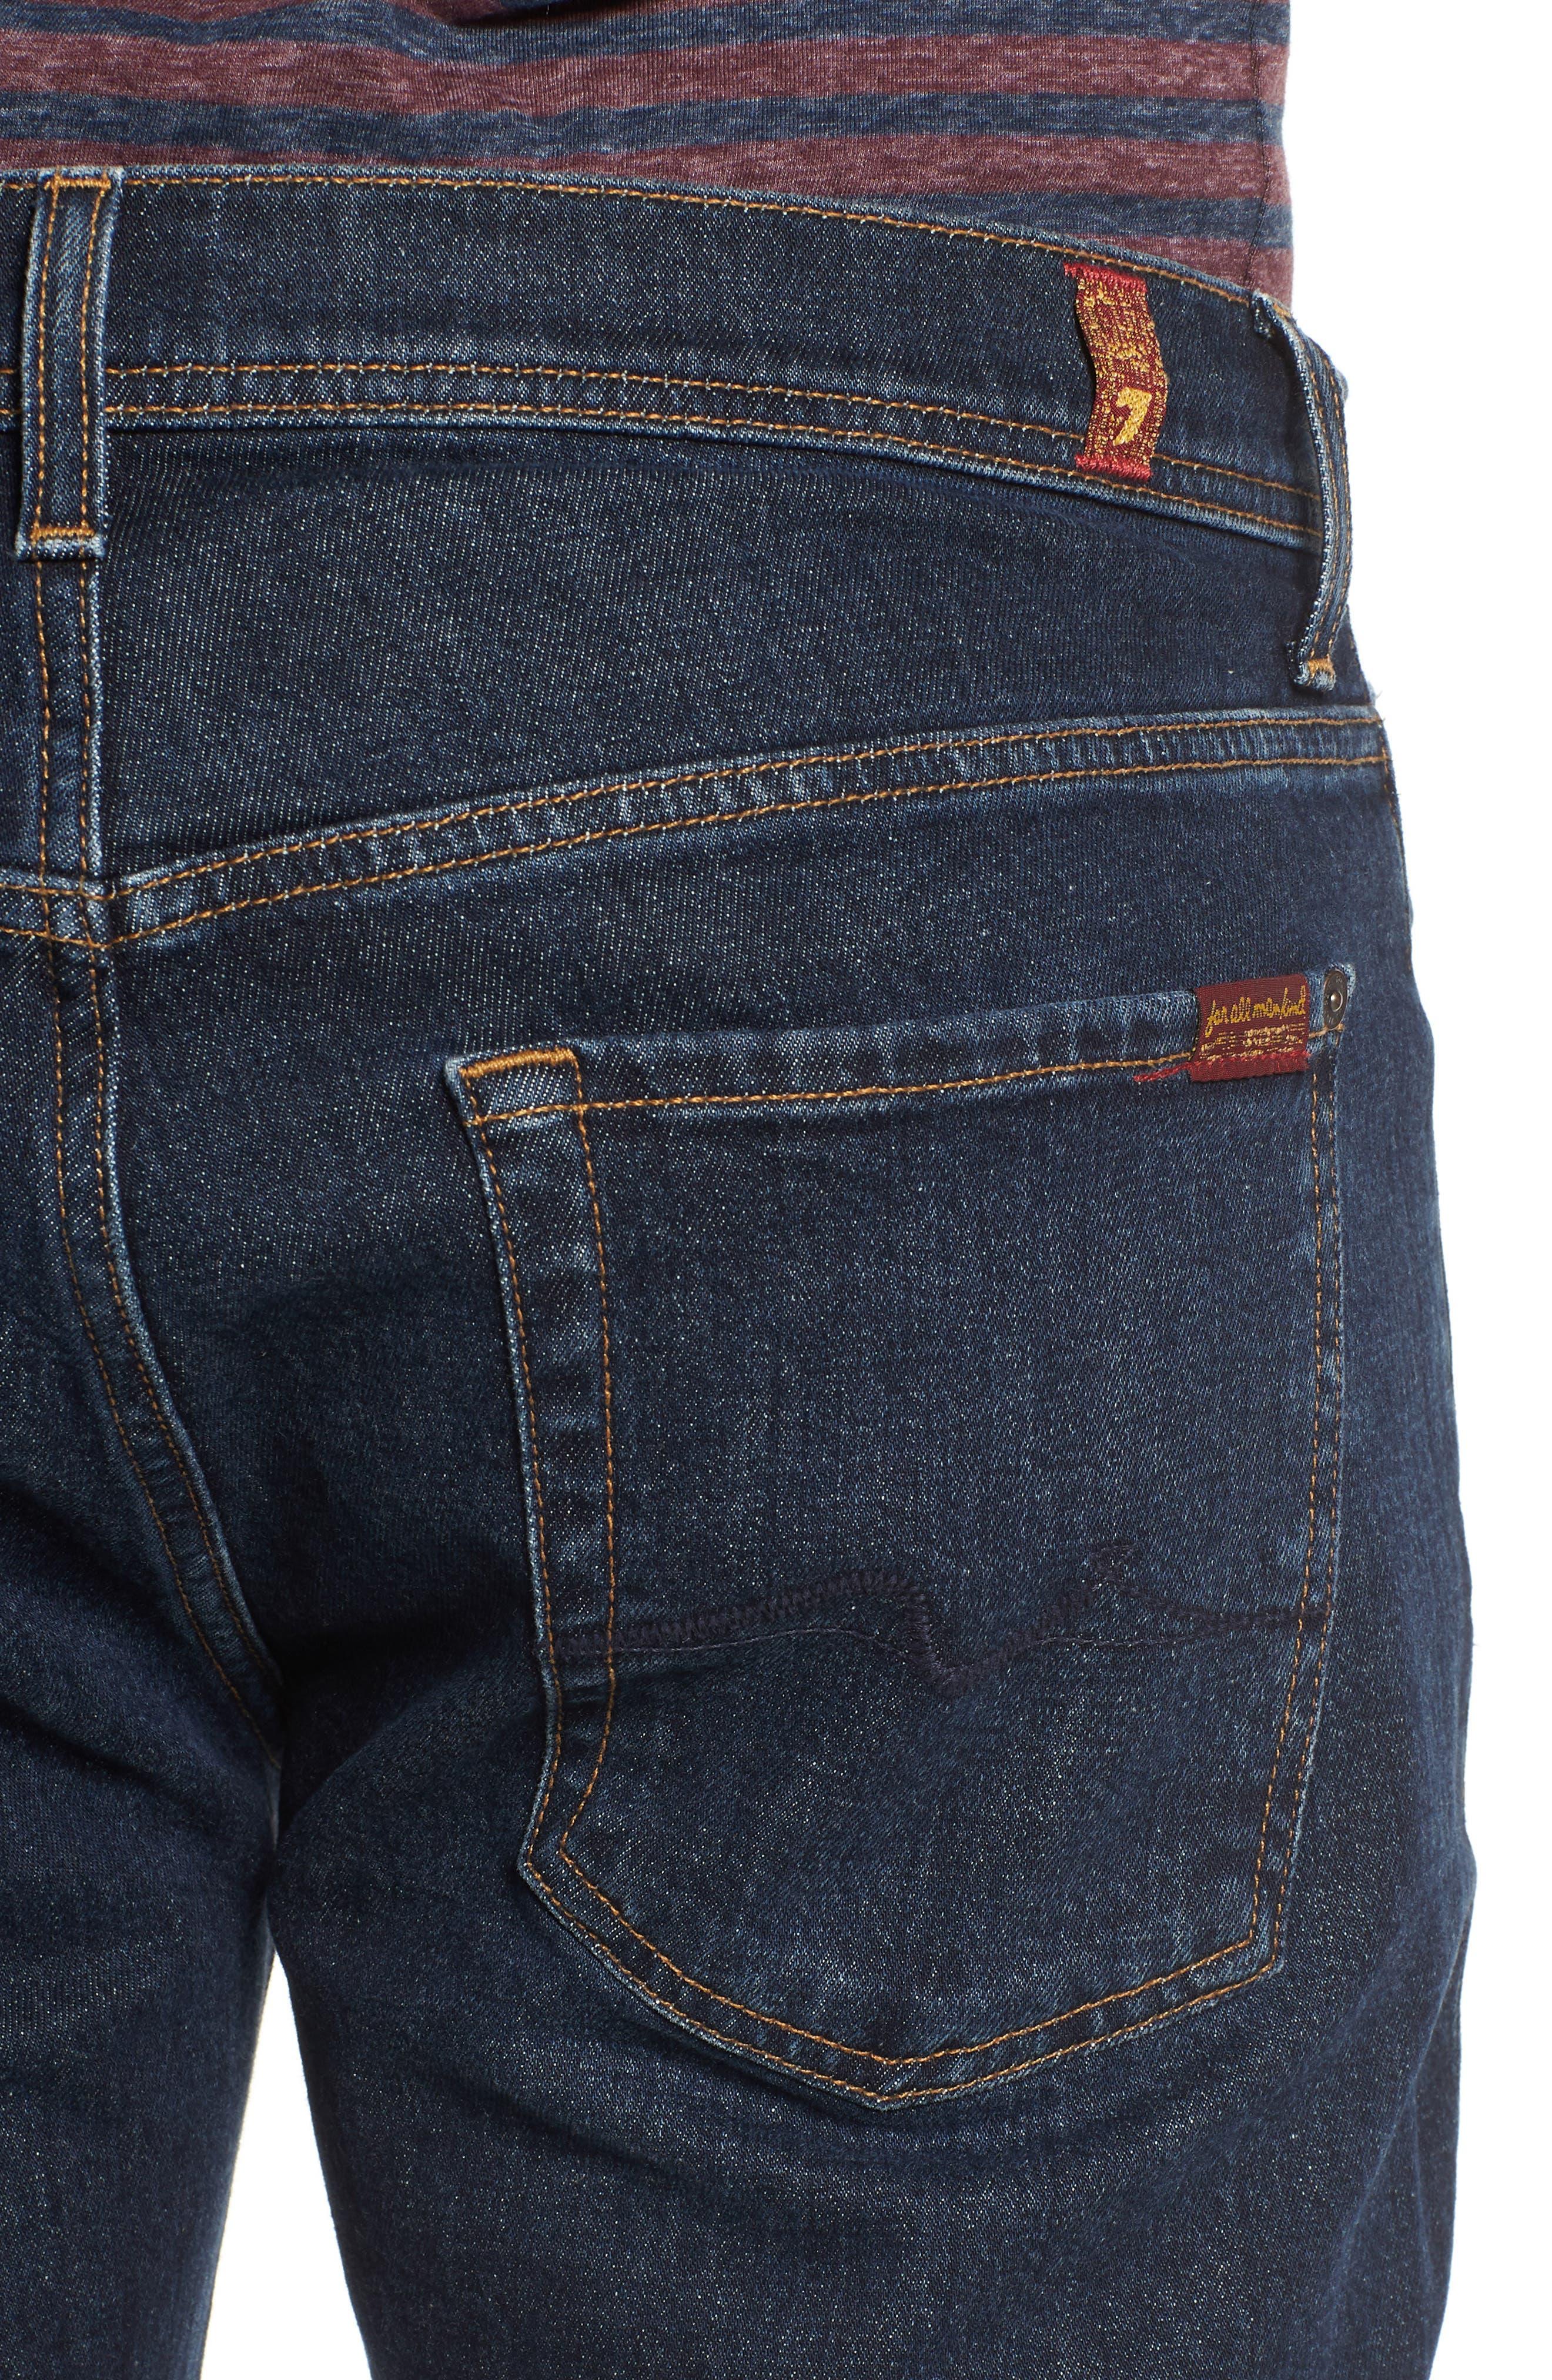 Brett Bootcut Jeans,                             Alternate thumbnail 4, color,